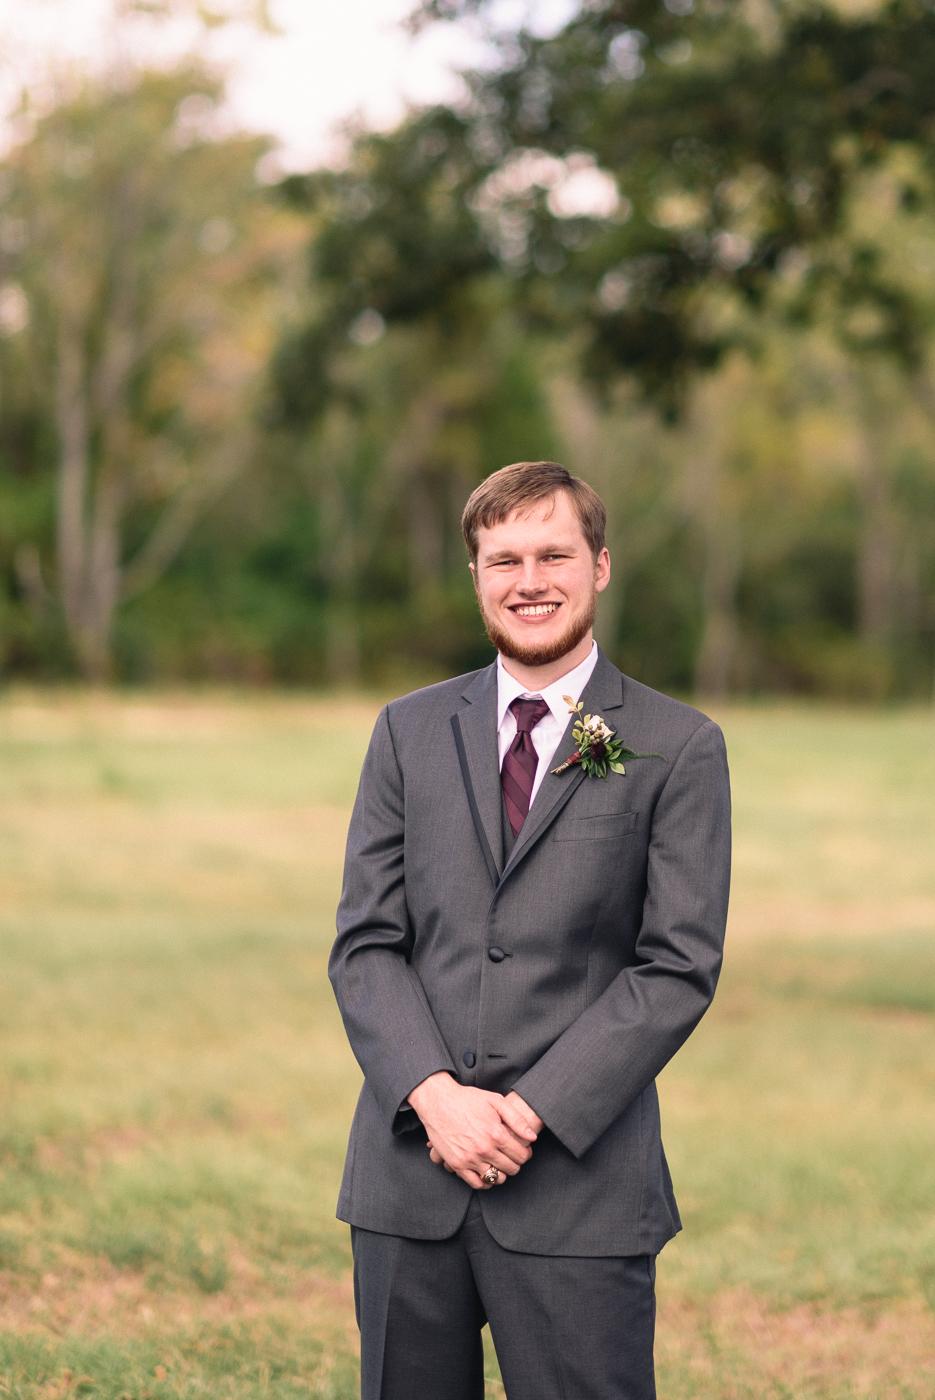 Groom Portrait Maroon tie Texas A&M Ring Texas Aggie Ring Boutonniere beard